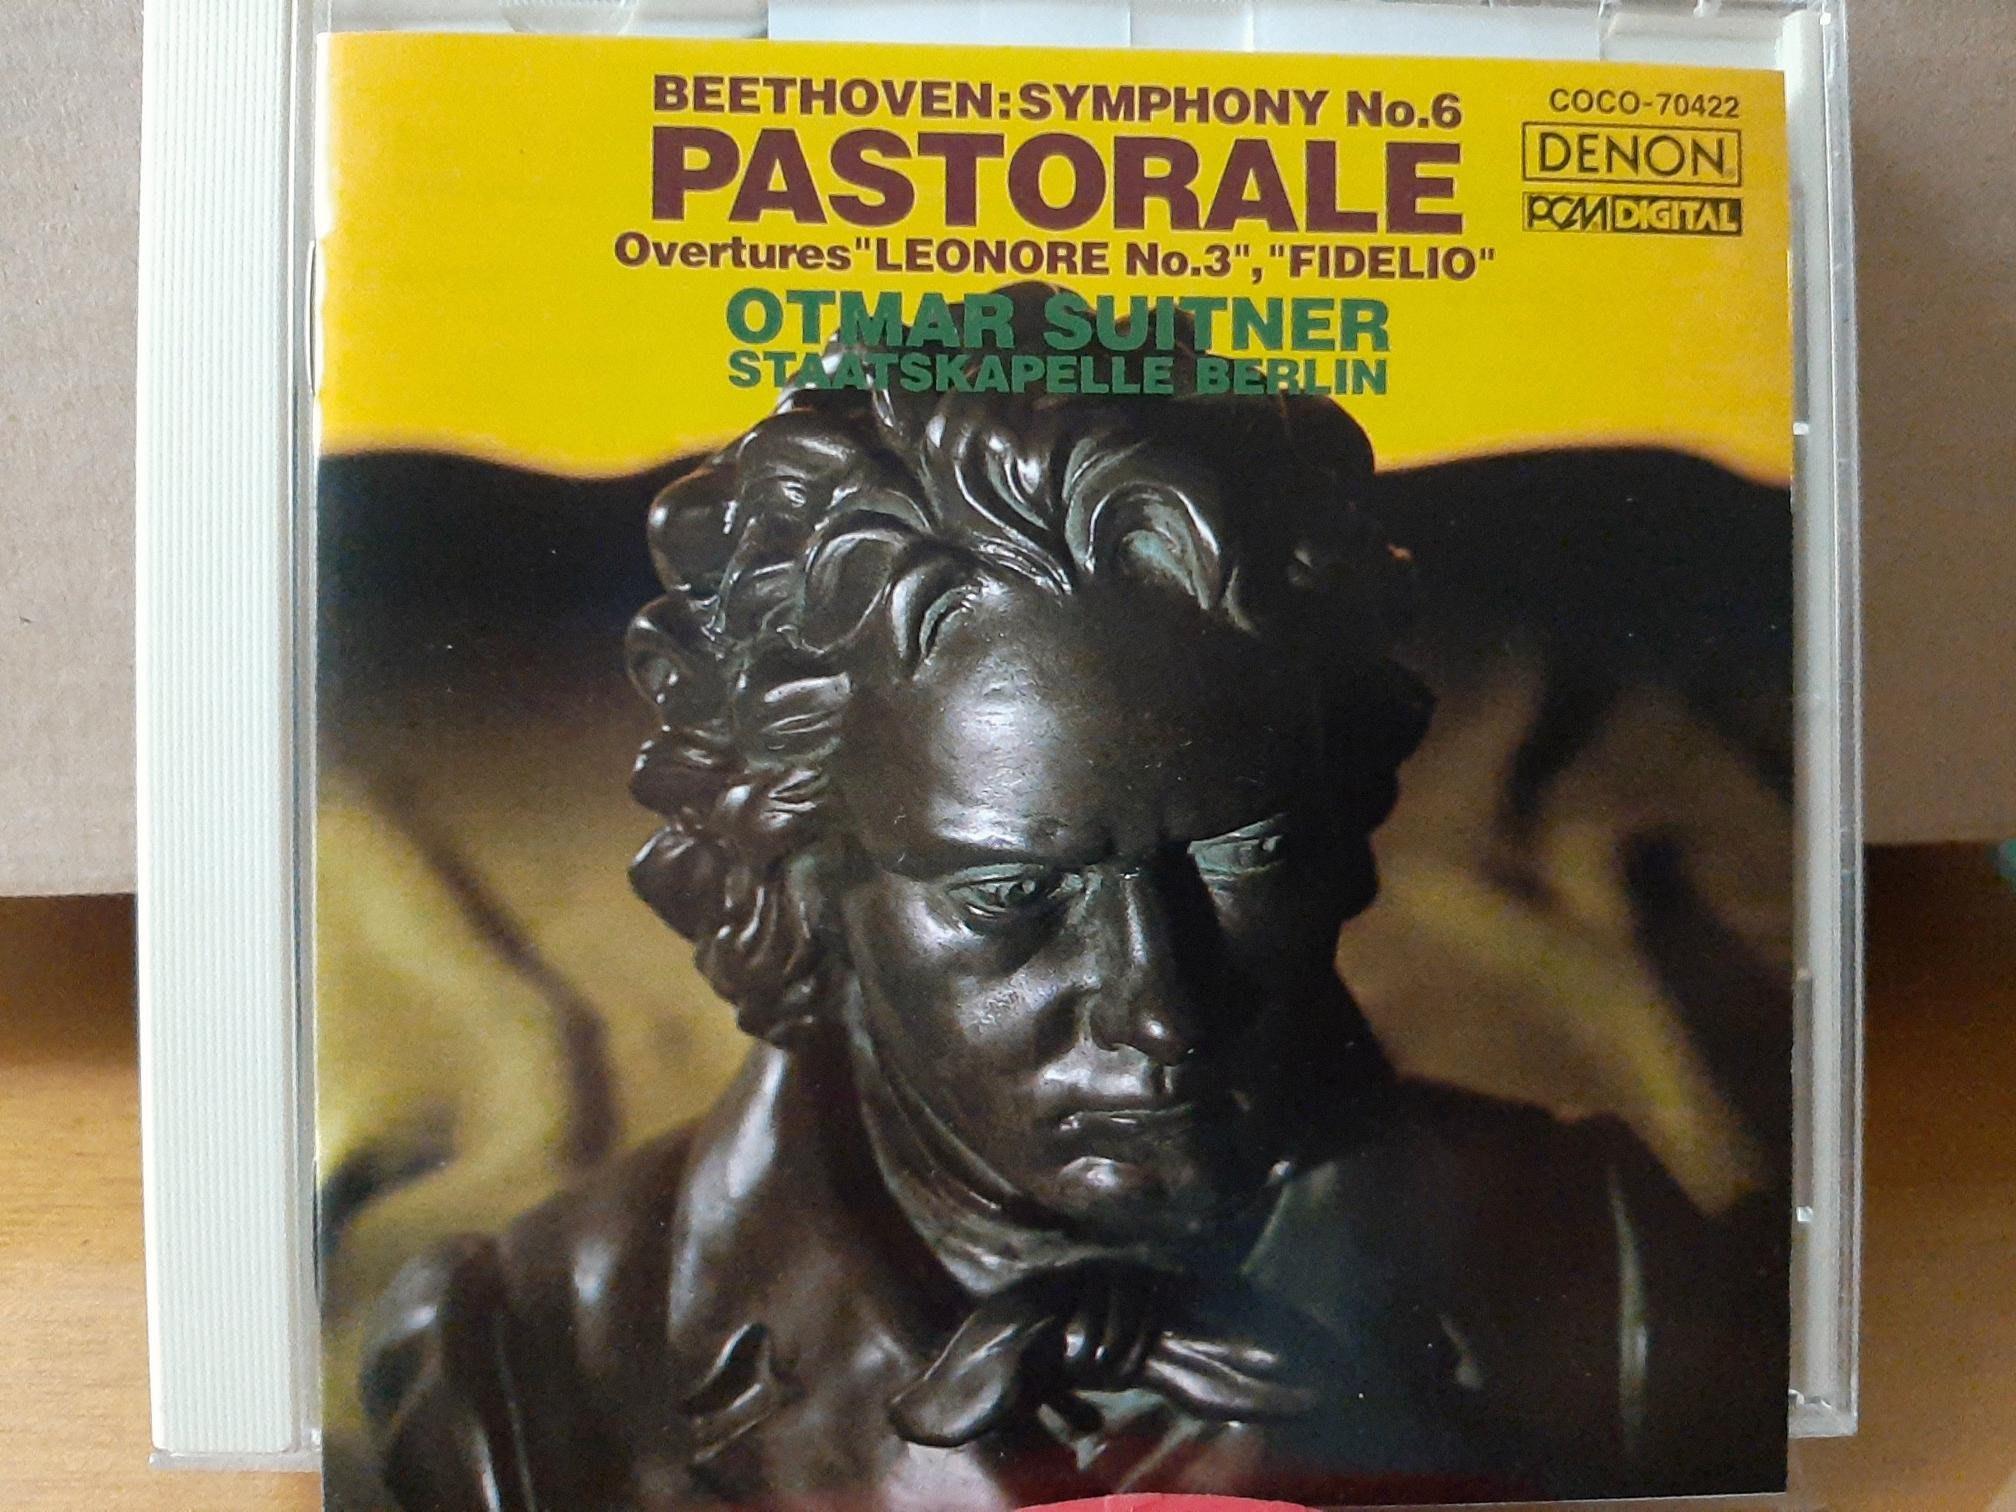 Suitner,Beethoven-Sym No.6Pastorale,舒特納指揮柏林國家歌劇院樂團,演繹貝多芬-第6號田園交響曲,序曲等。